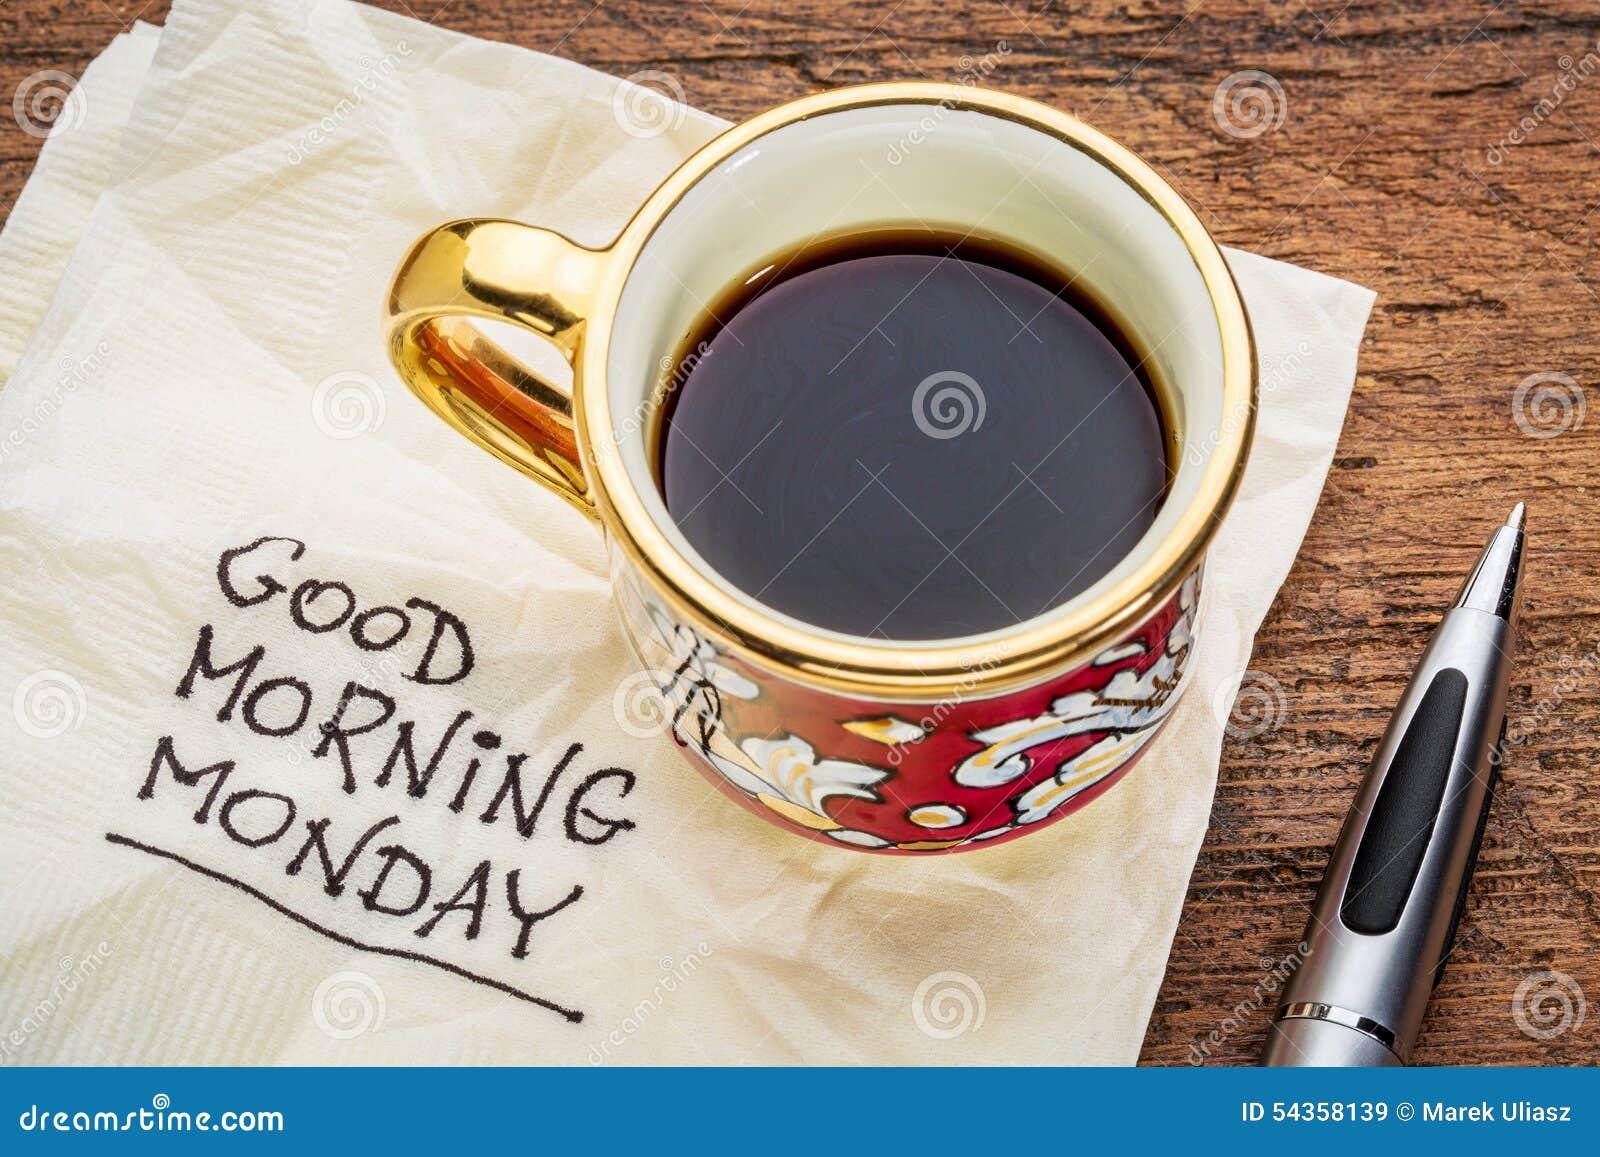 Bom dia, segunda-feira no guardanapo